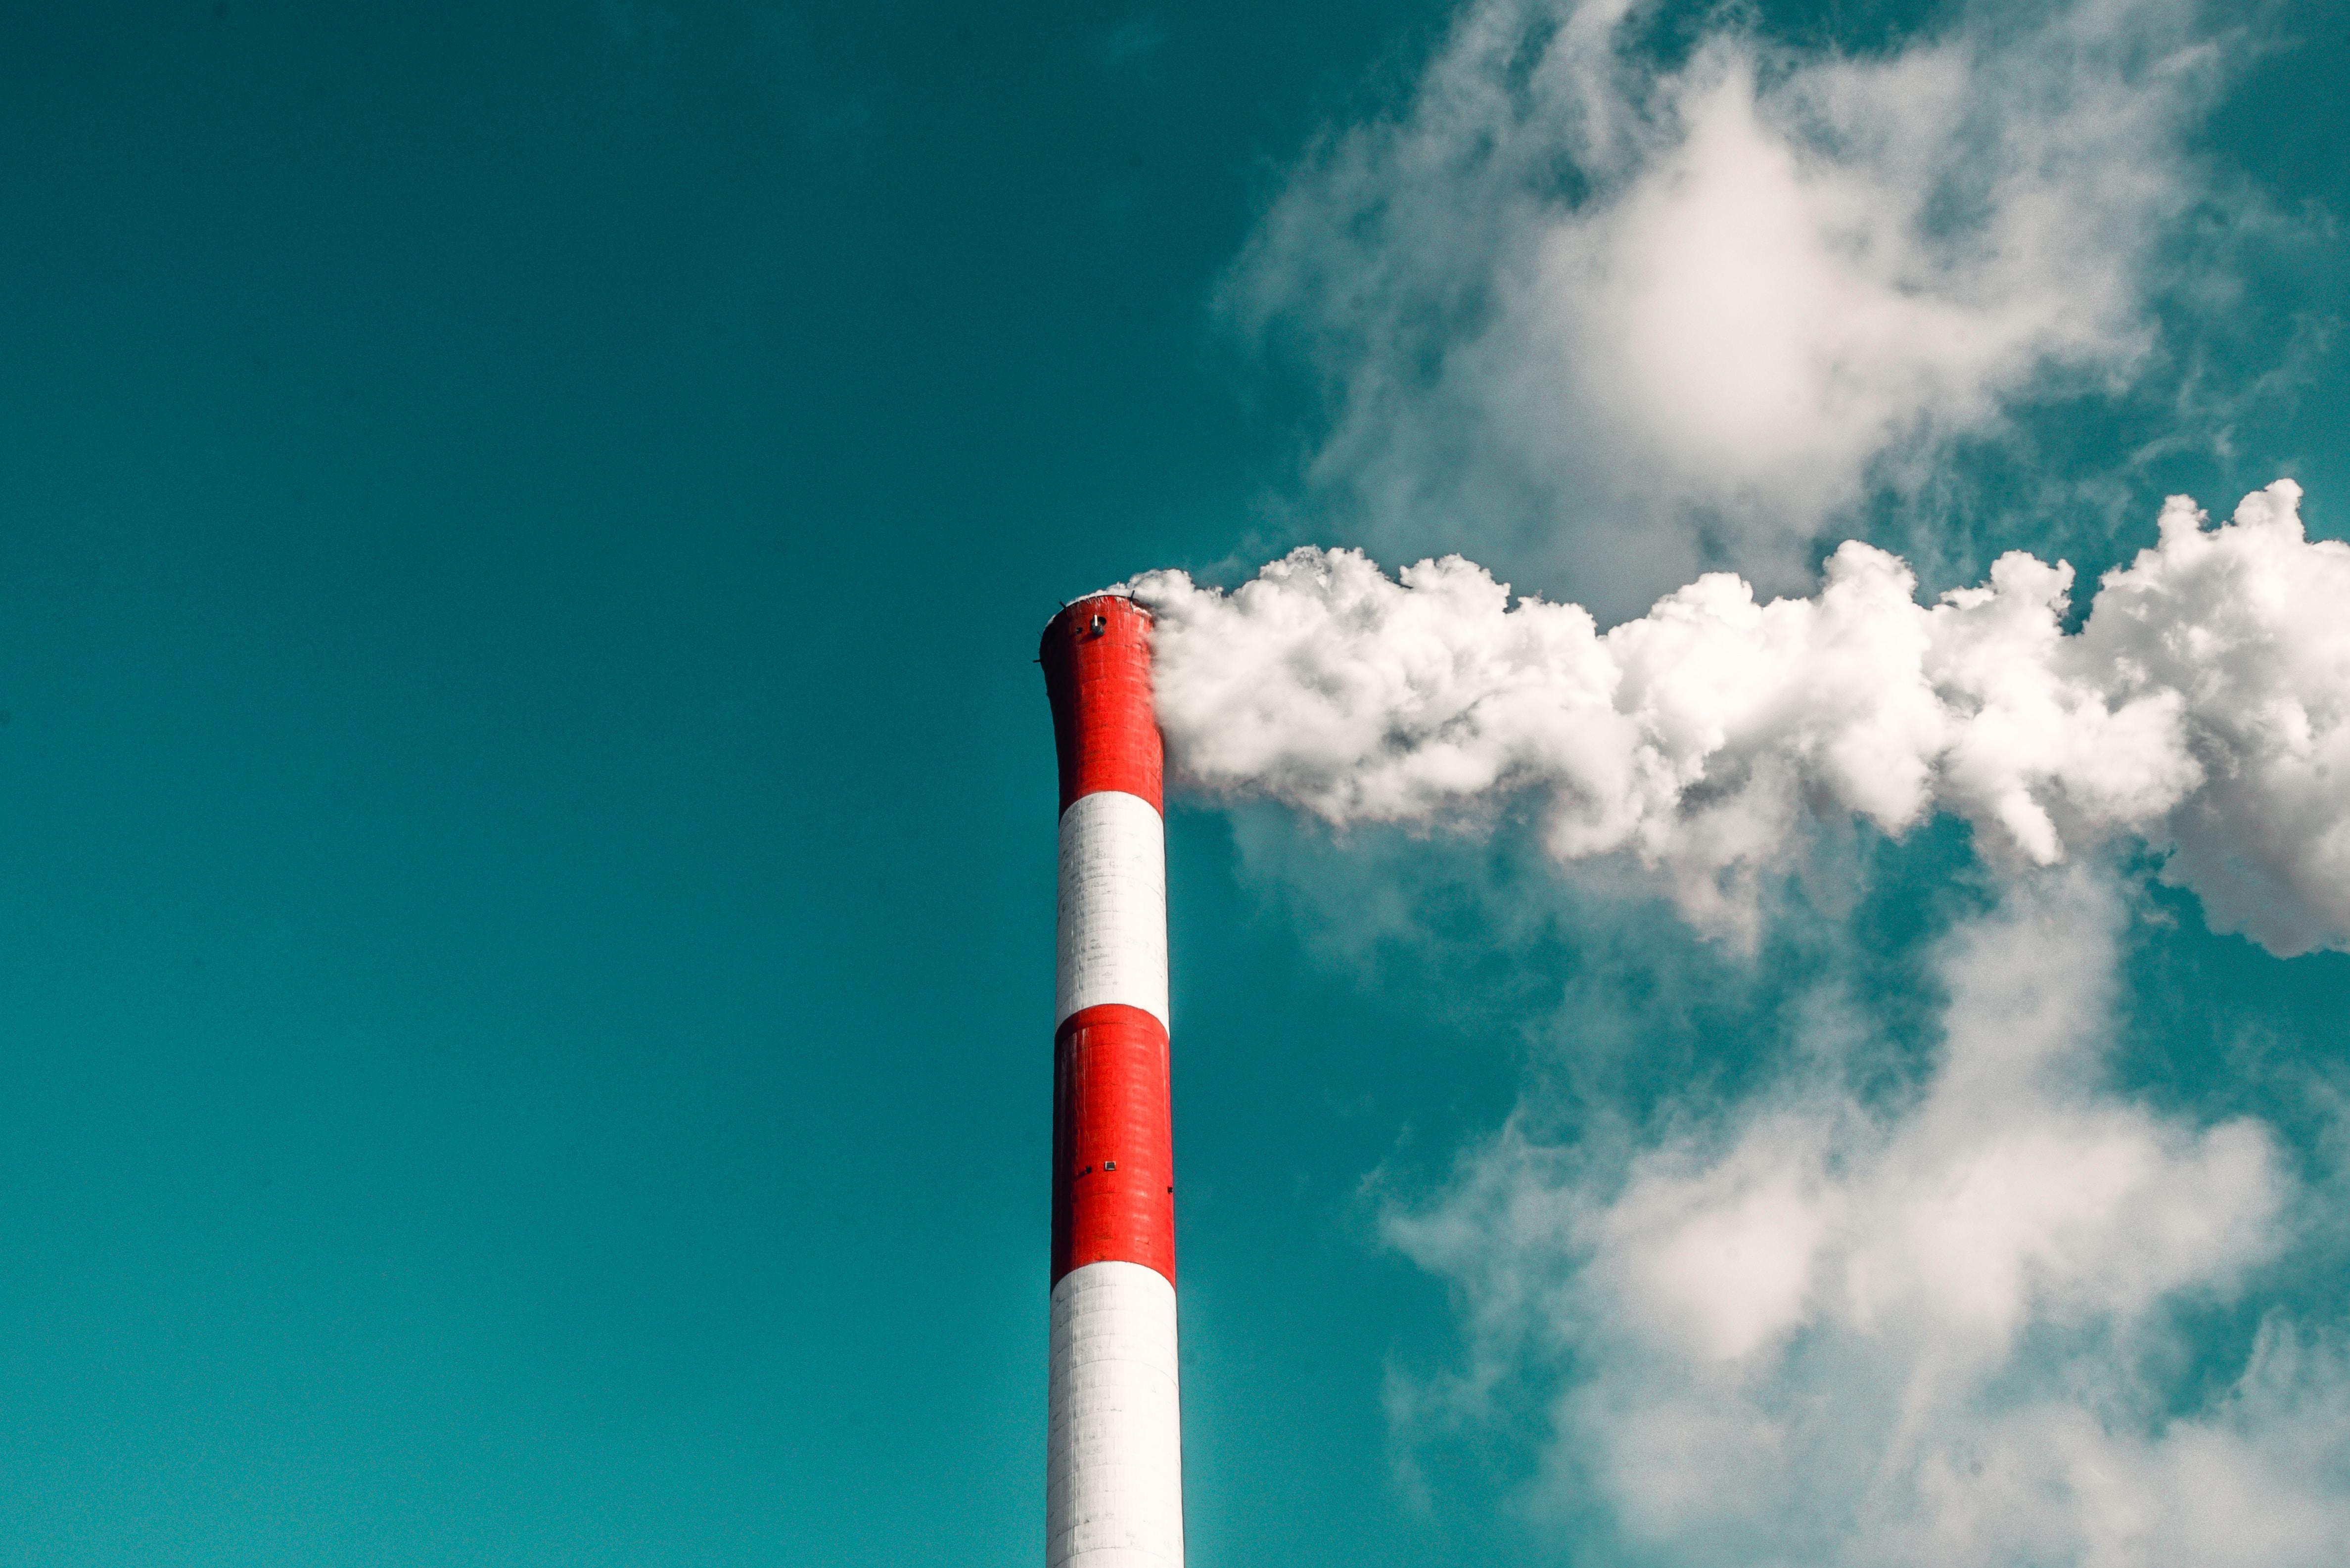 Industrie Umwelt Abgase